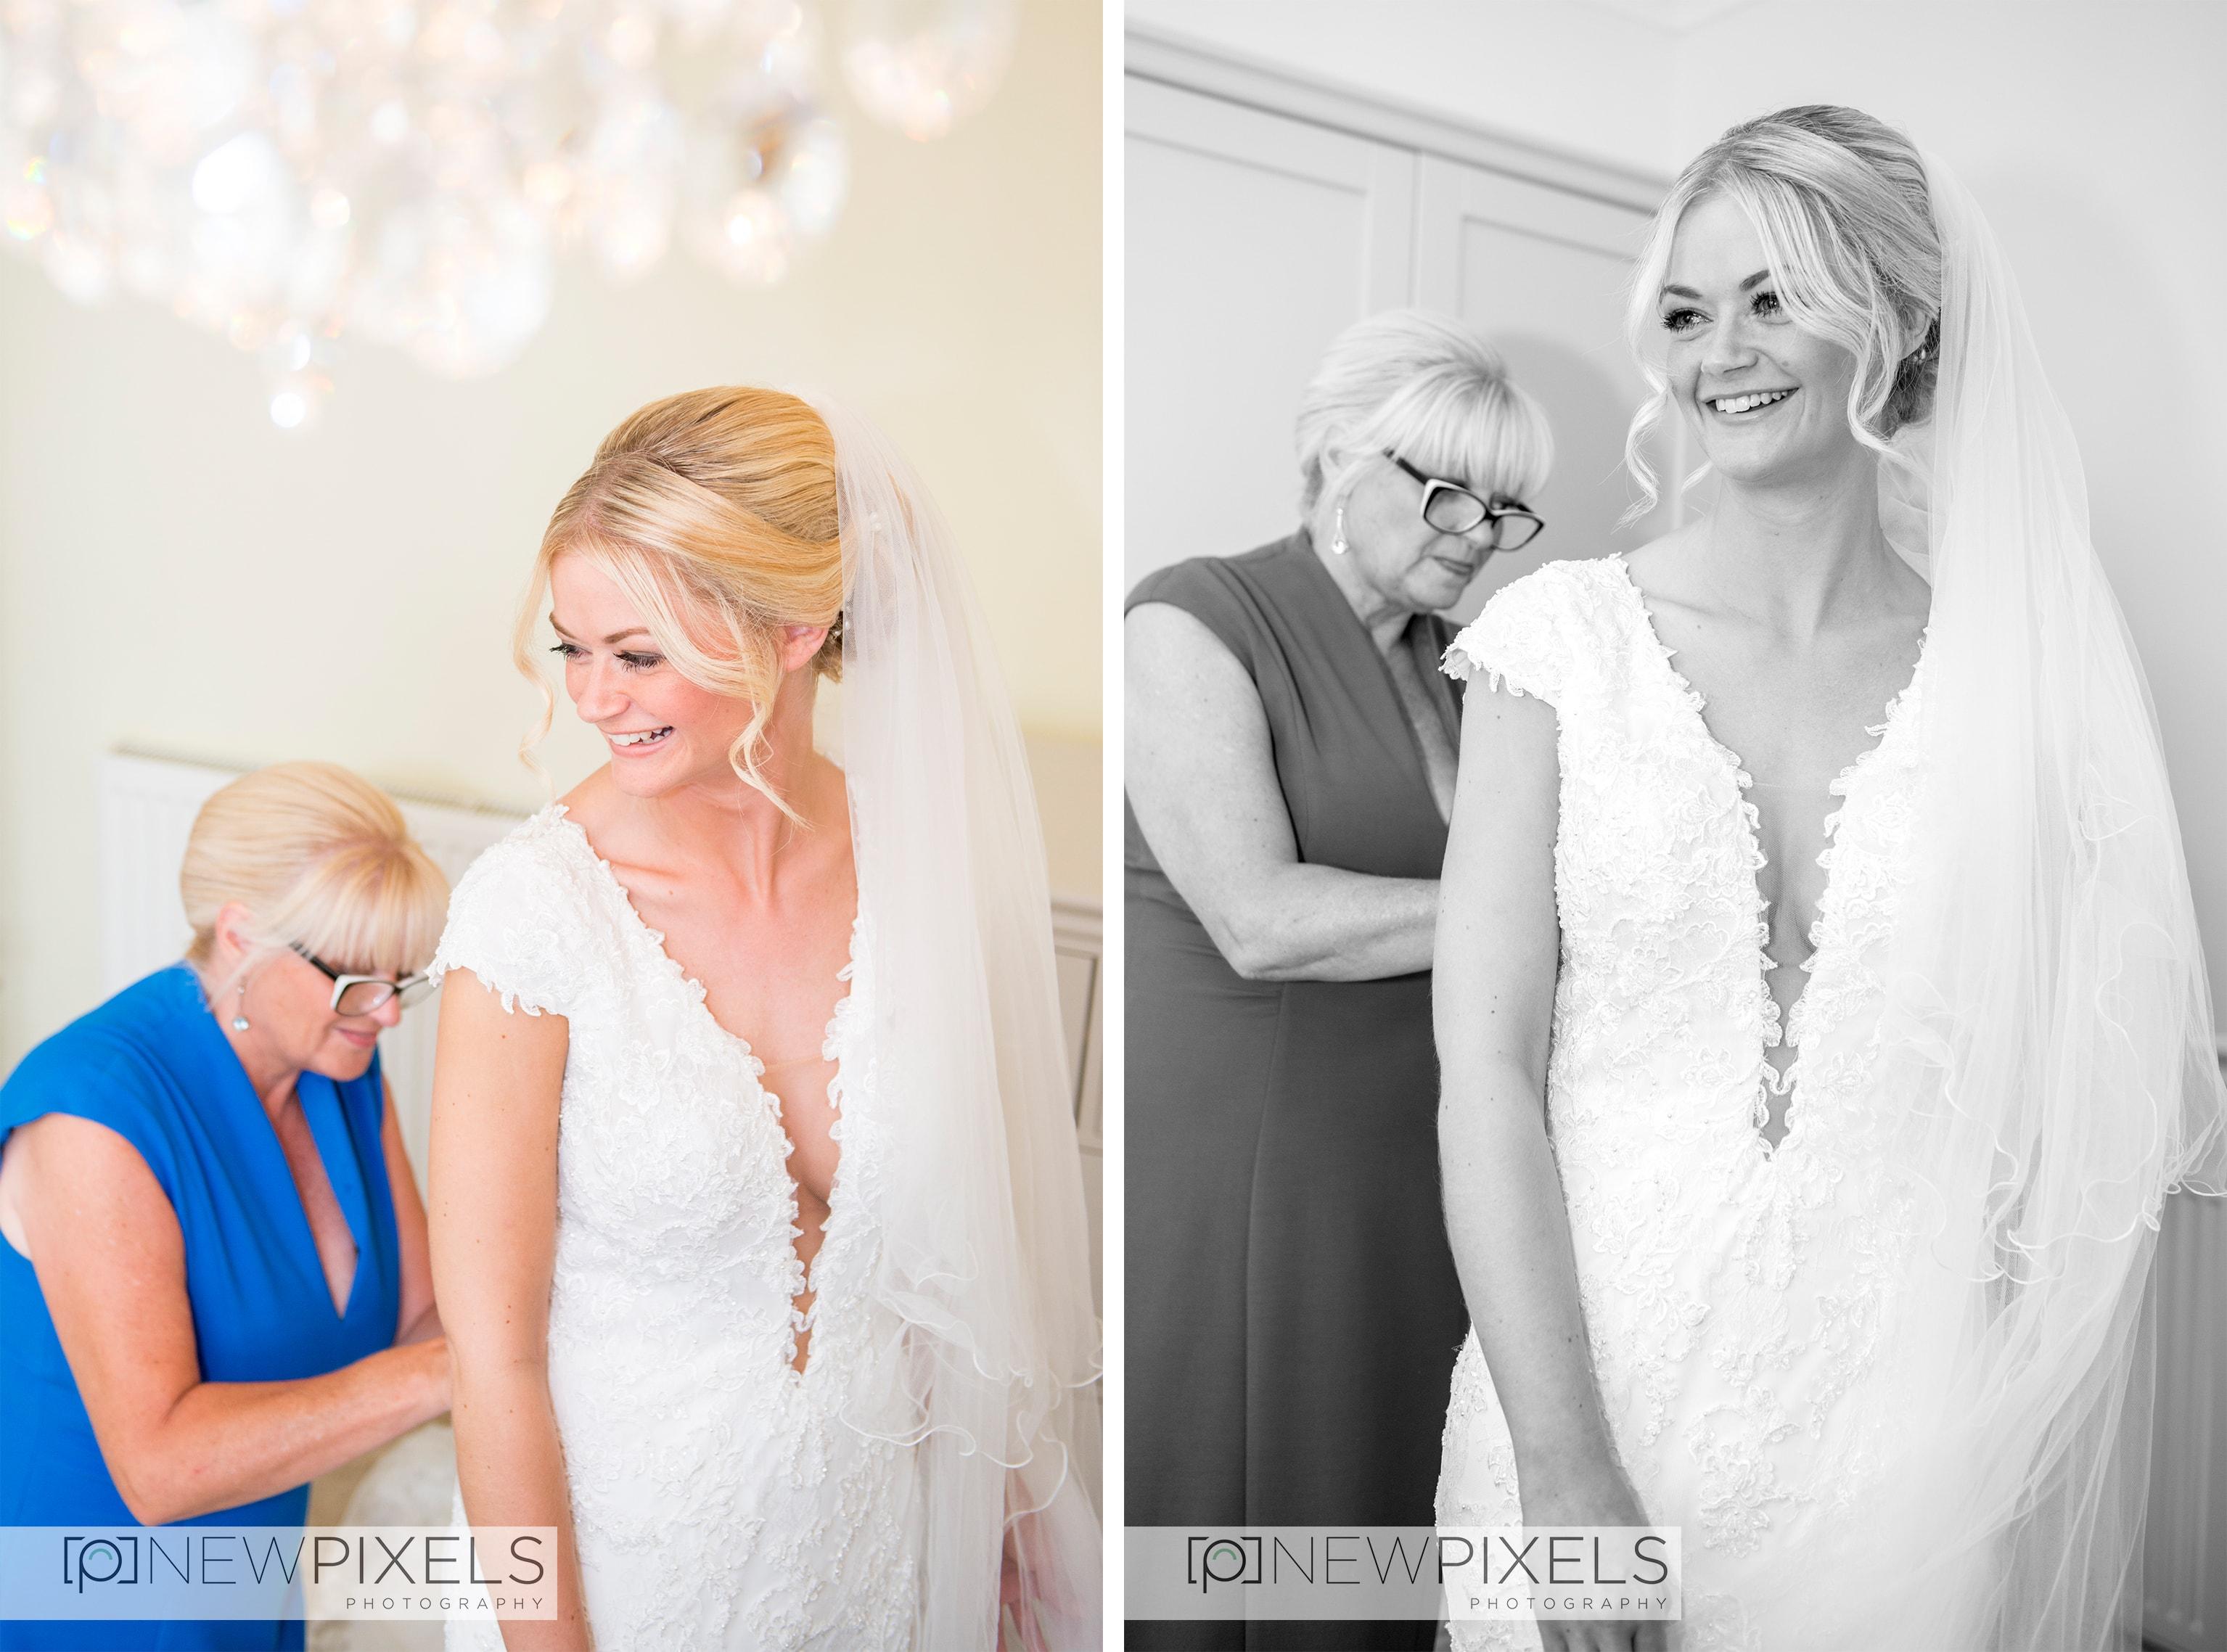 bridal prep wedding photographer hertfordshire